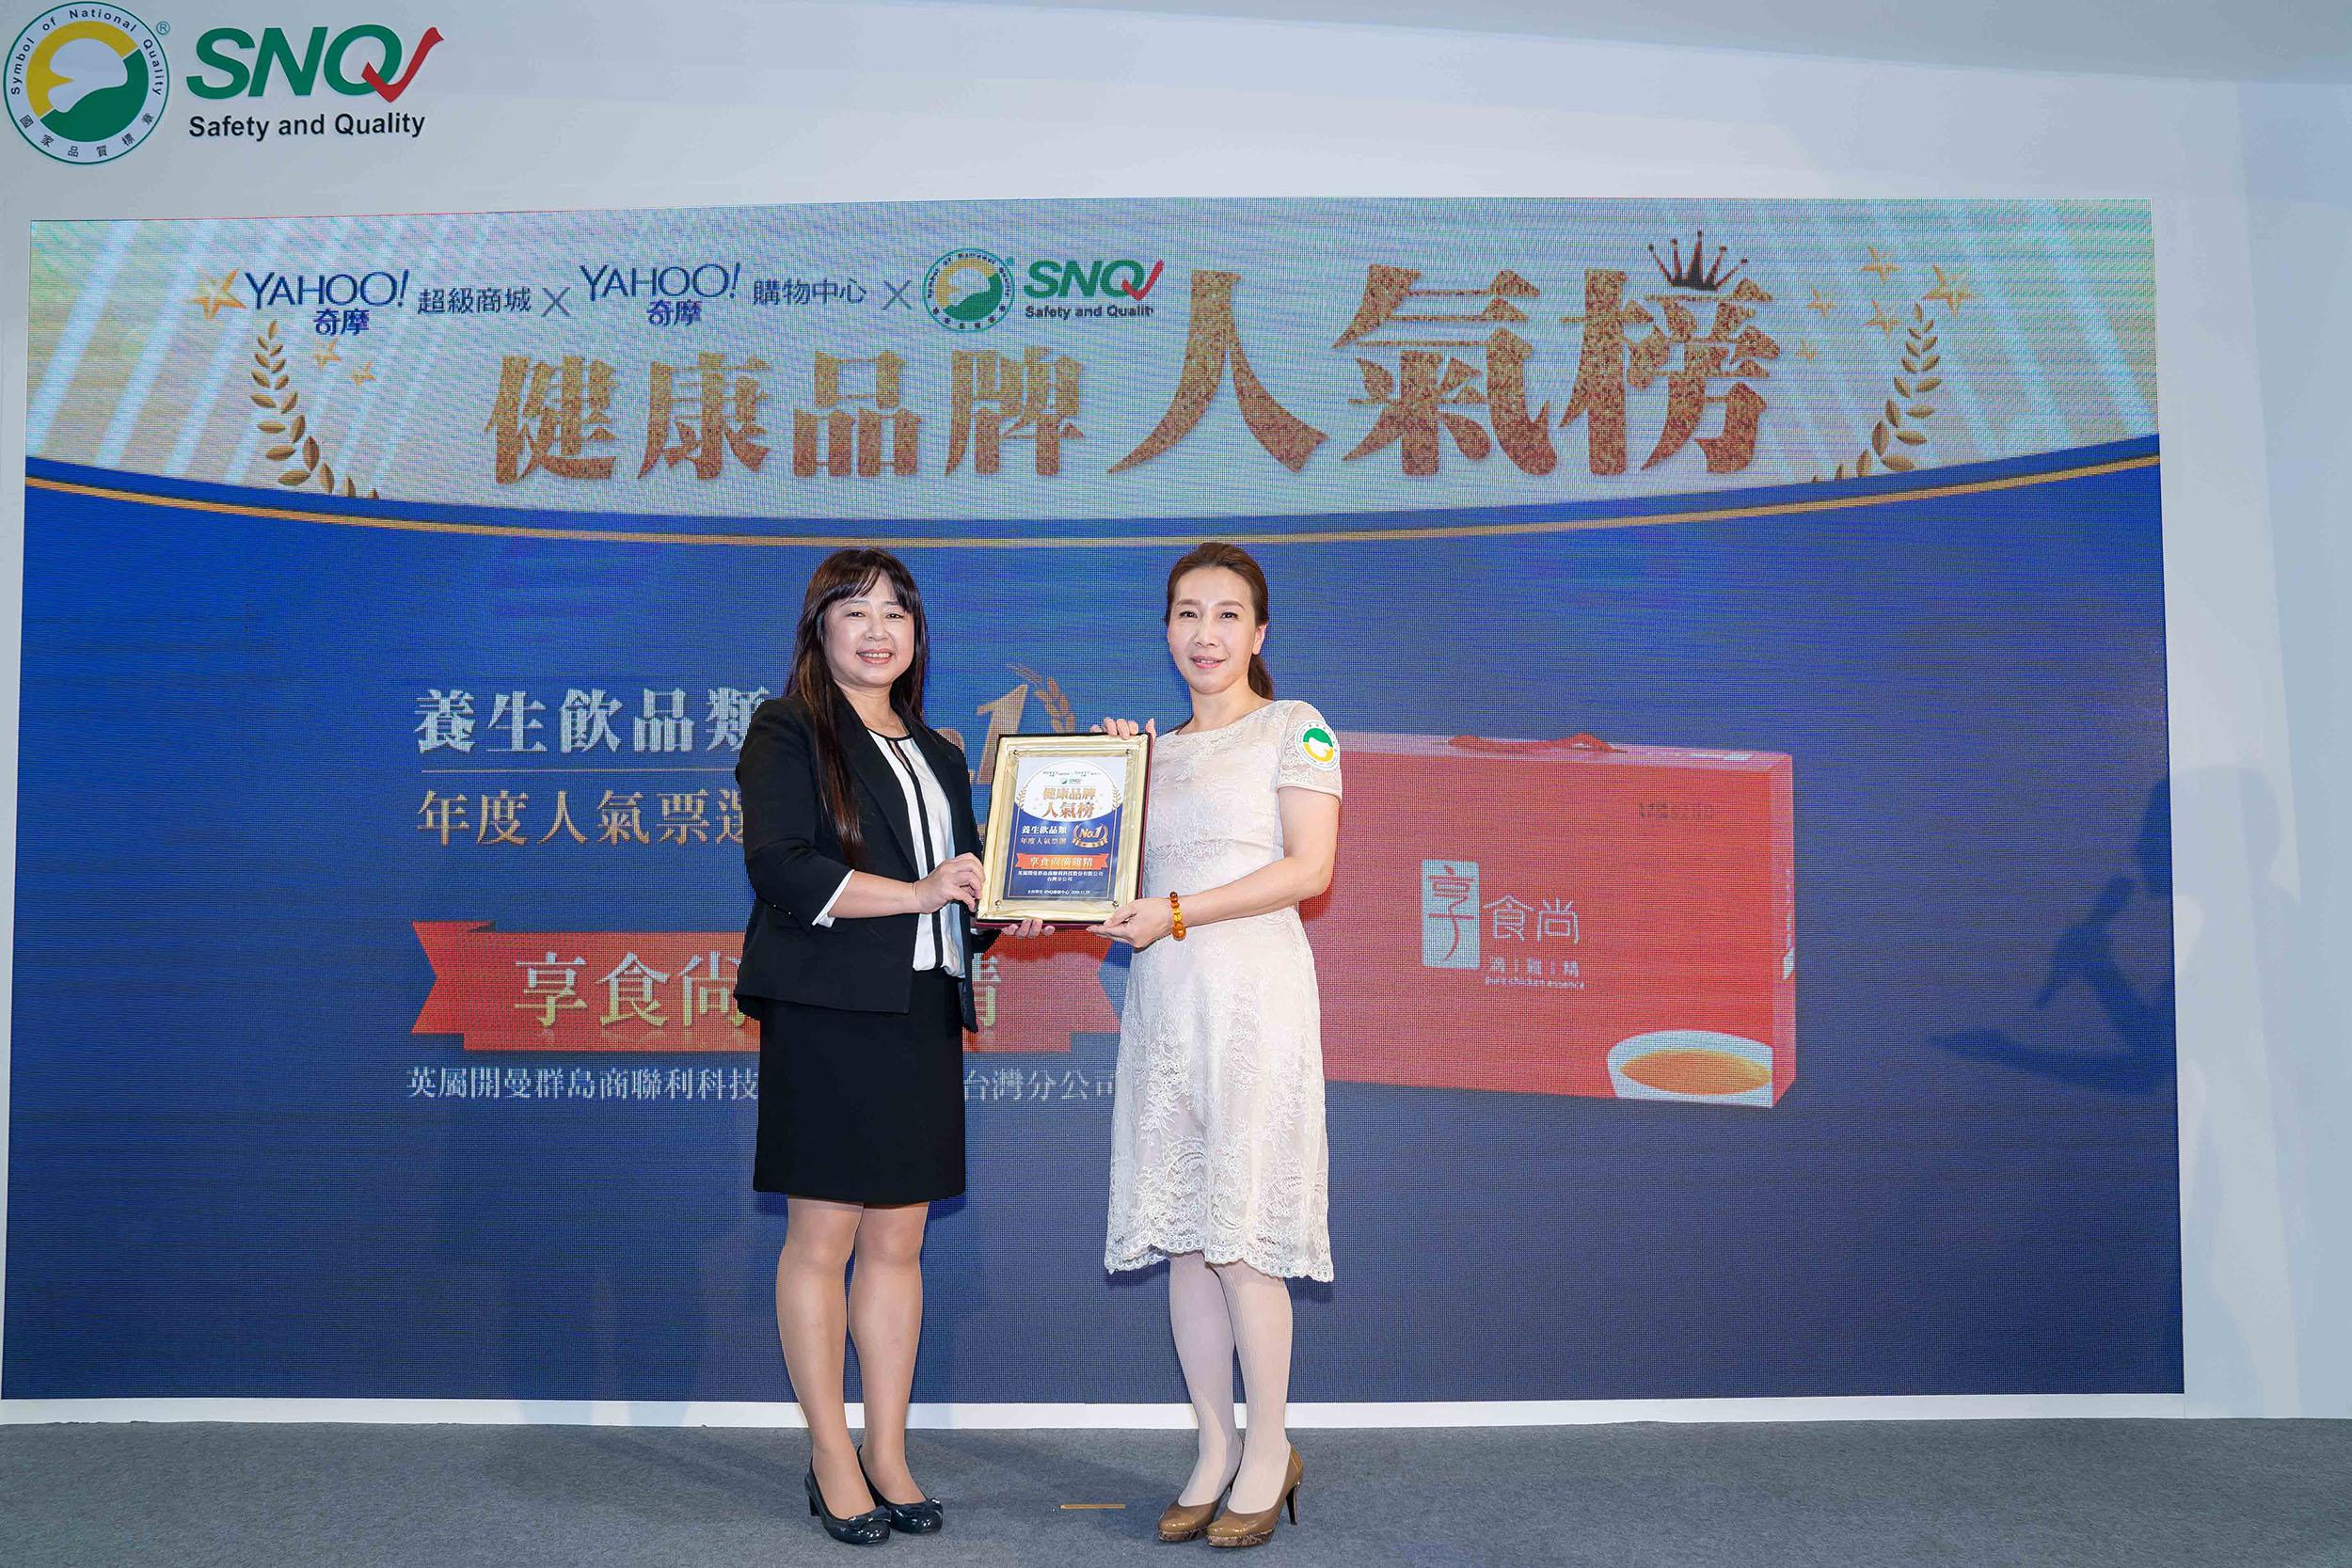 TVBS《女人我最大》主持人藍心湄代言的享食尚滴雞精獲奬,聯利科技總經理朱蓓苓(右)代表上台領奬。